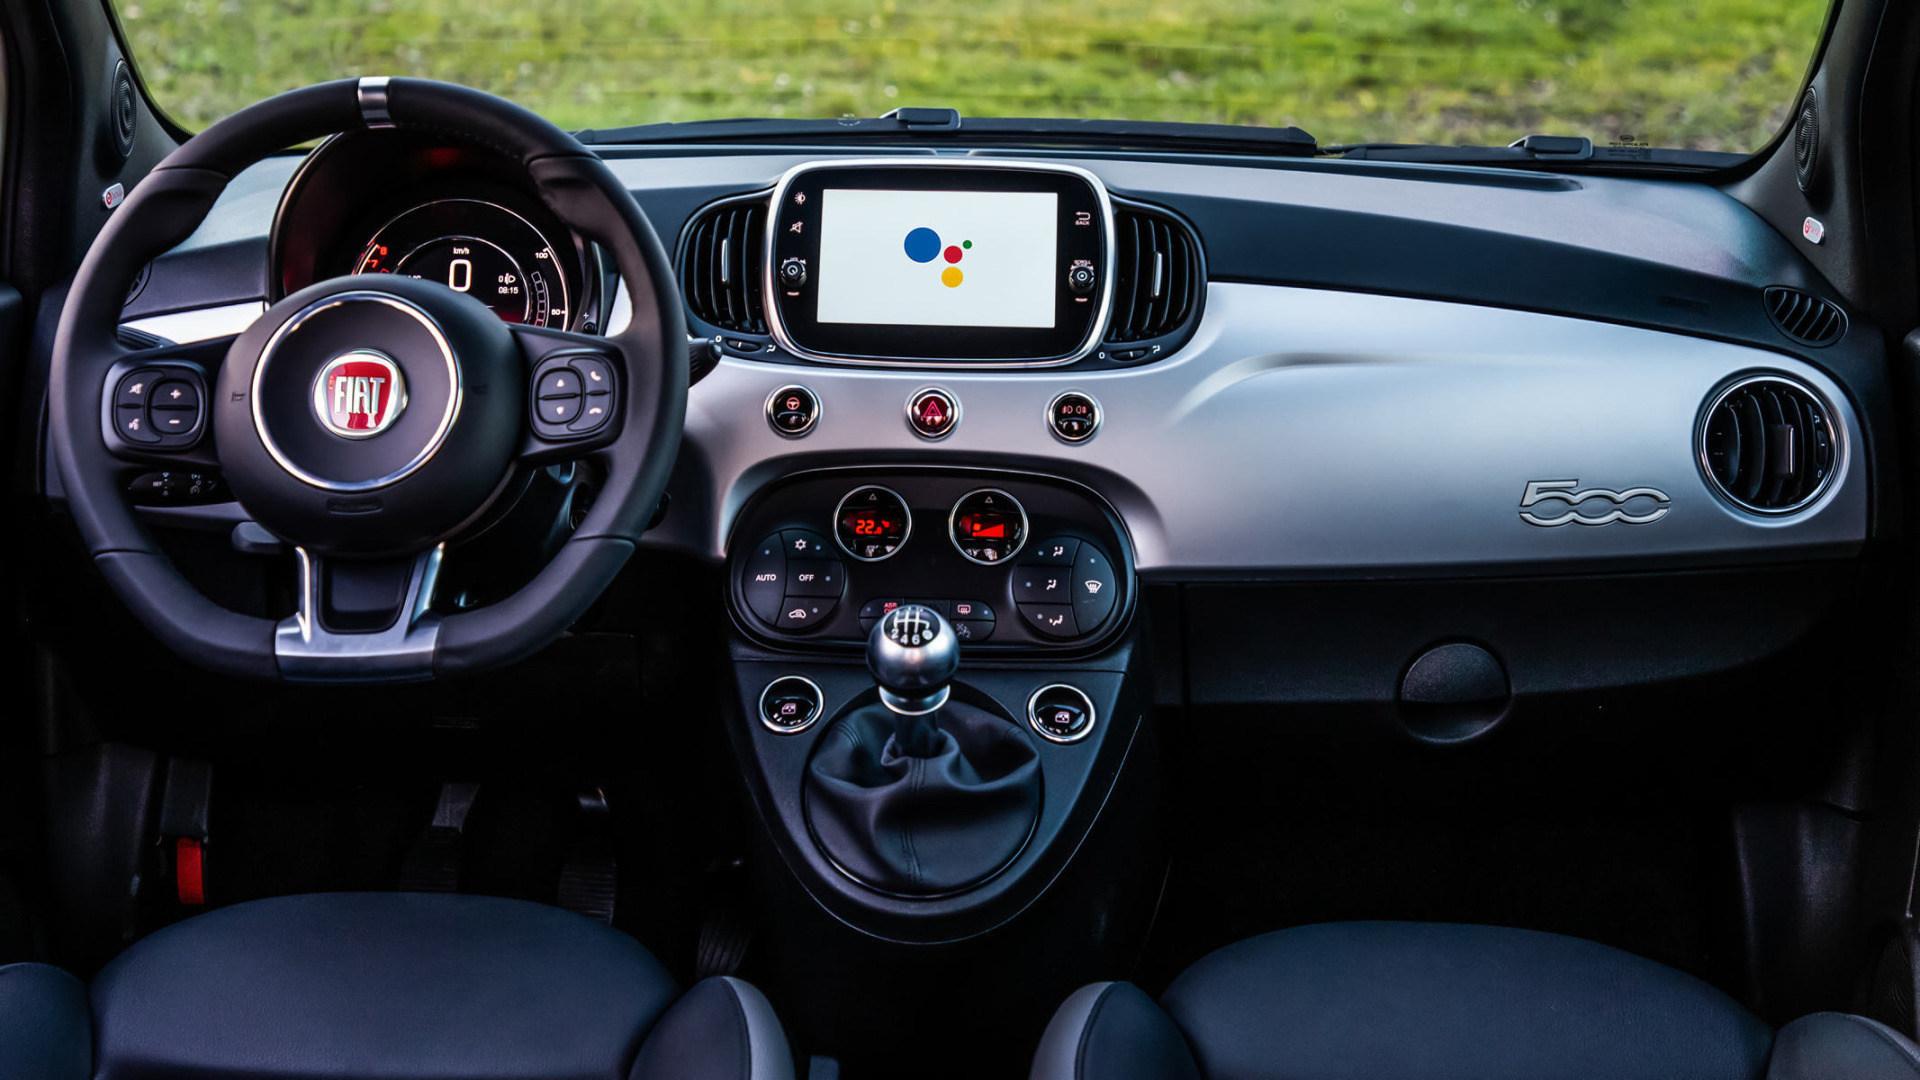 Google, Google Assistant, Fiat, Fiat 500, Hey Google, Sondermodell, Fiat 500 Hey Google